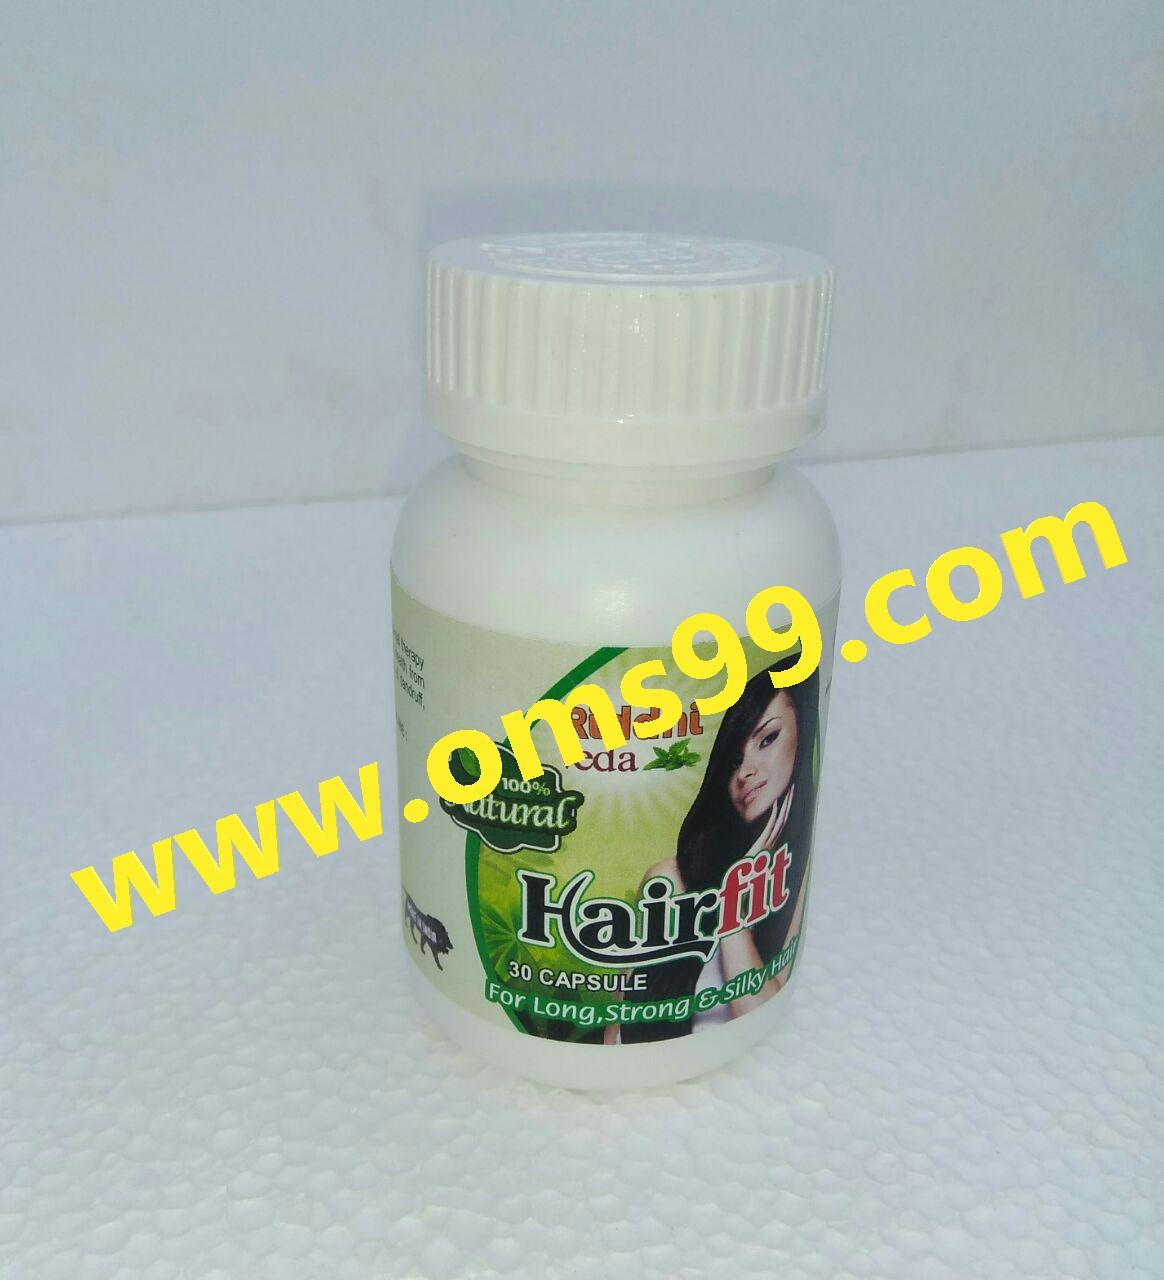 Hairfit - Ayurvedic medicine